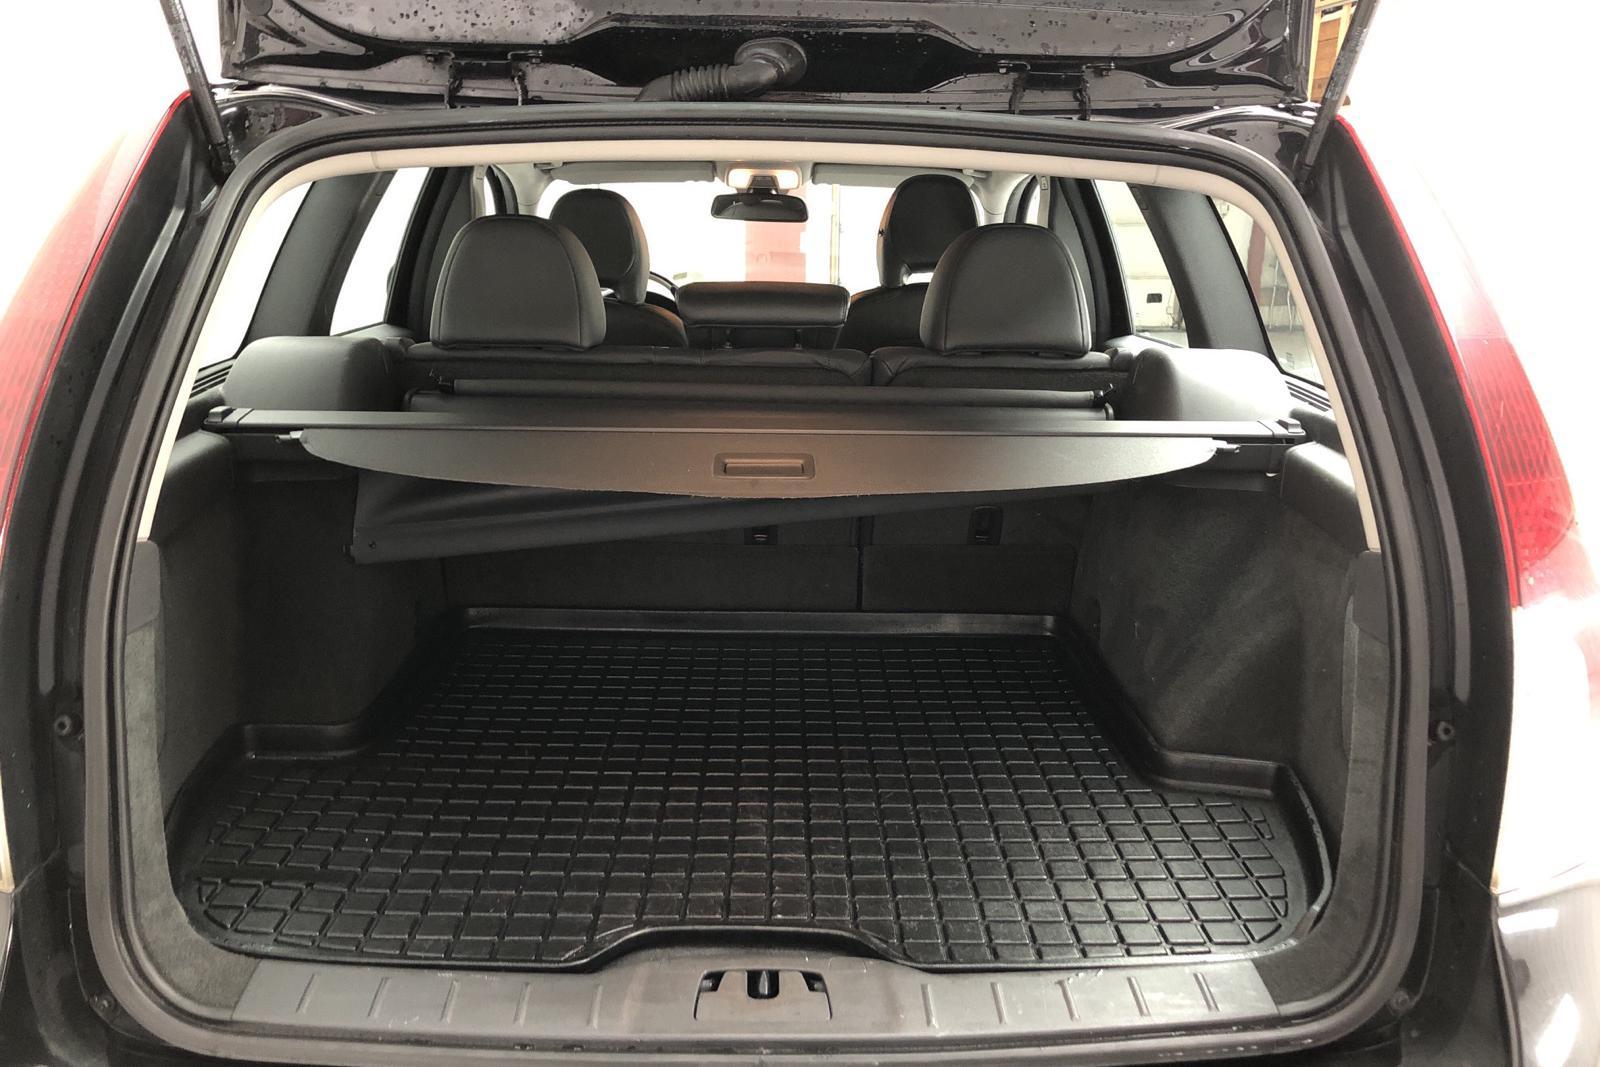 Volvo V50 D2 (115hk) - 13 437 mil - Manuell - svart - 2012